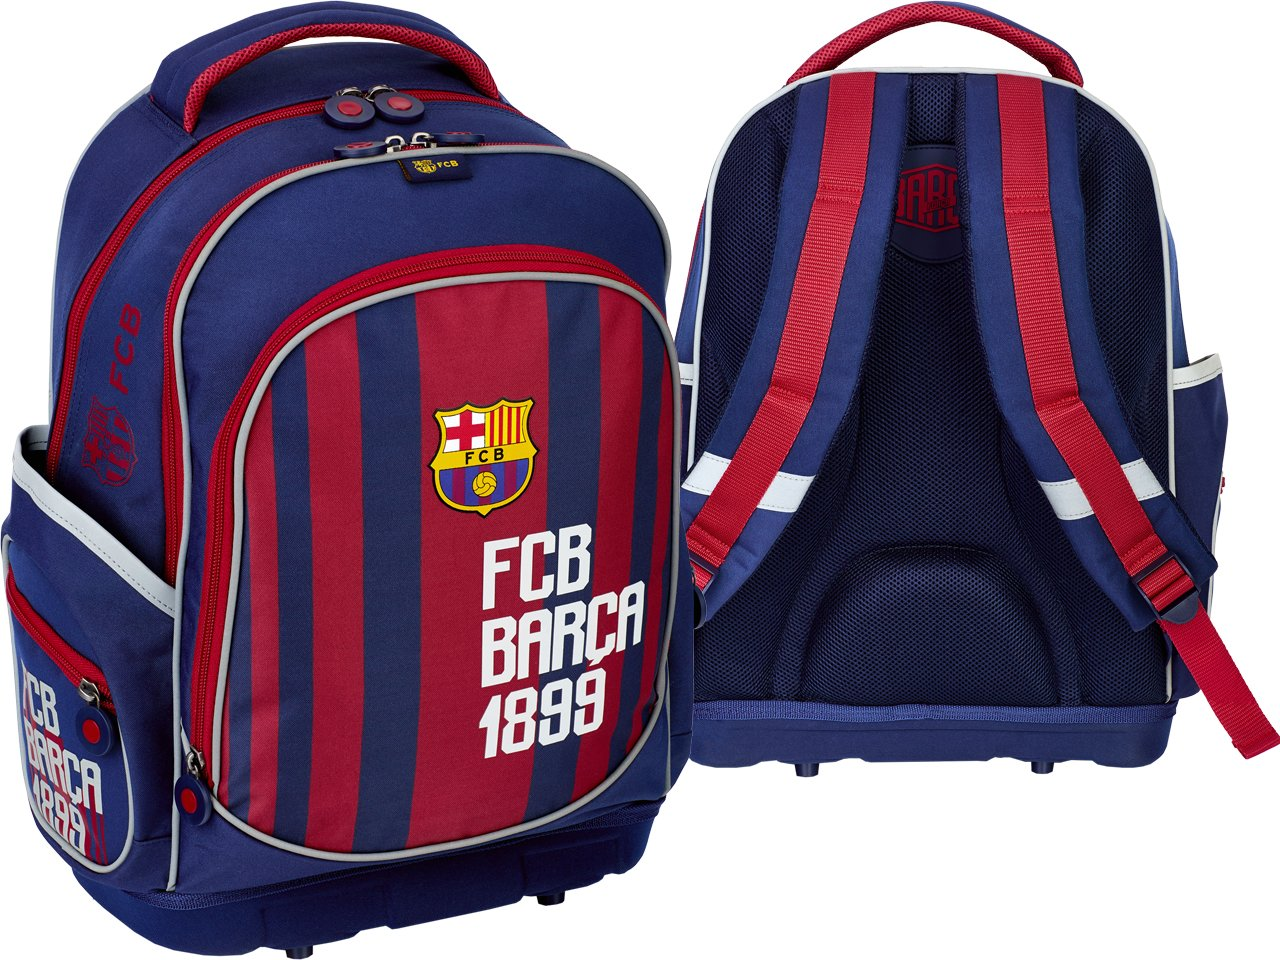 55cbffc3f0c19 FC BARCELONA Plecak Szkolny FC-181 tornister Barca - 7448161389 ...